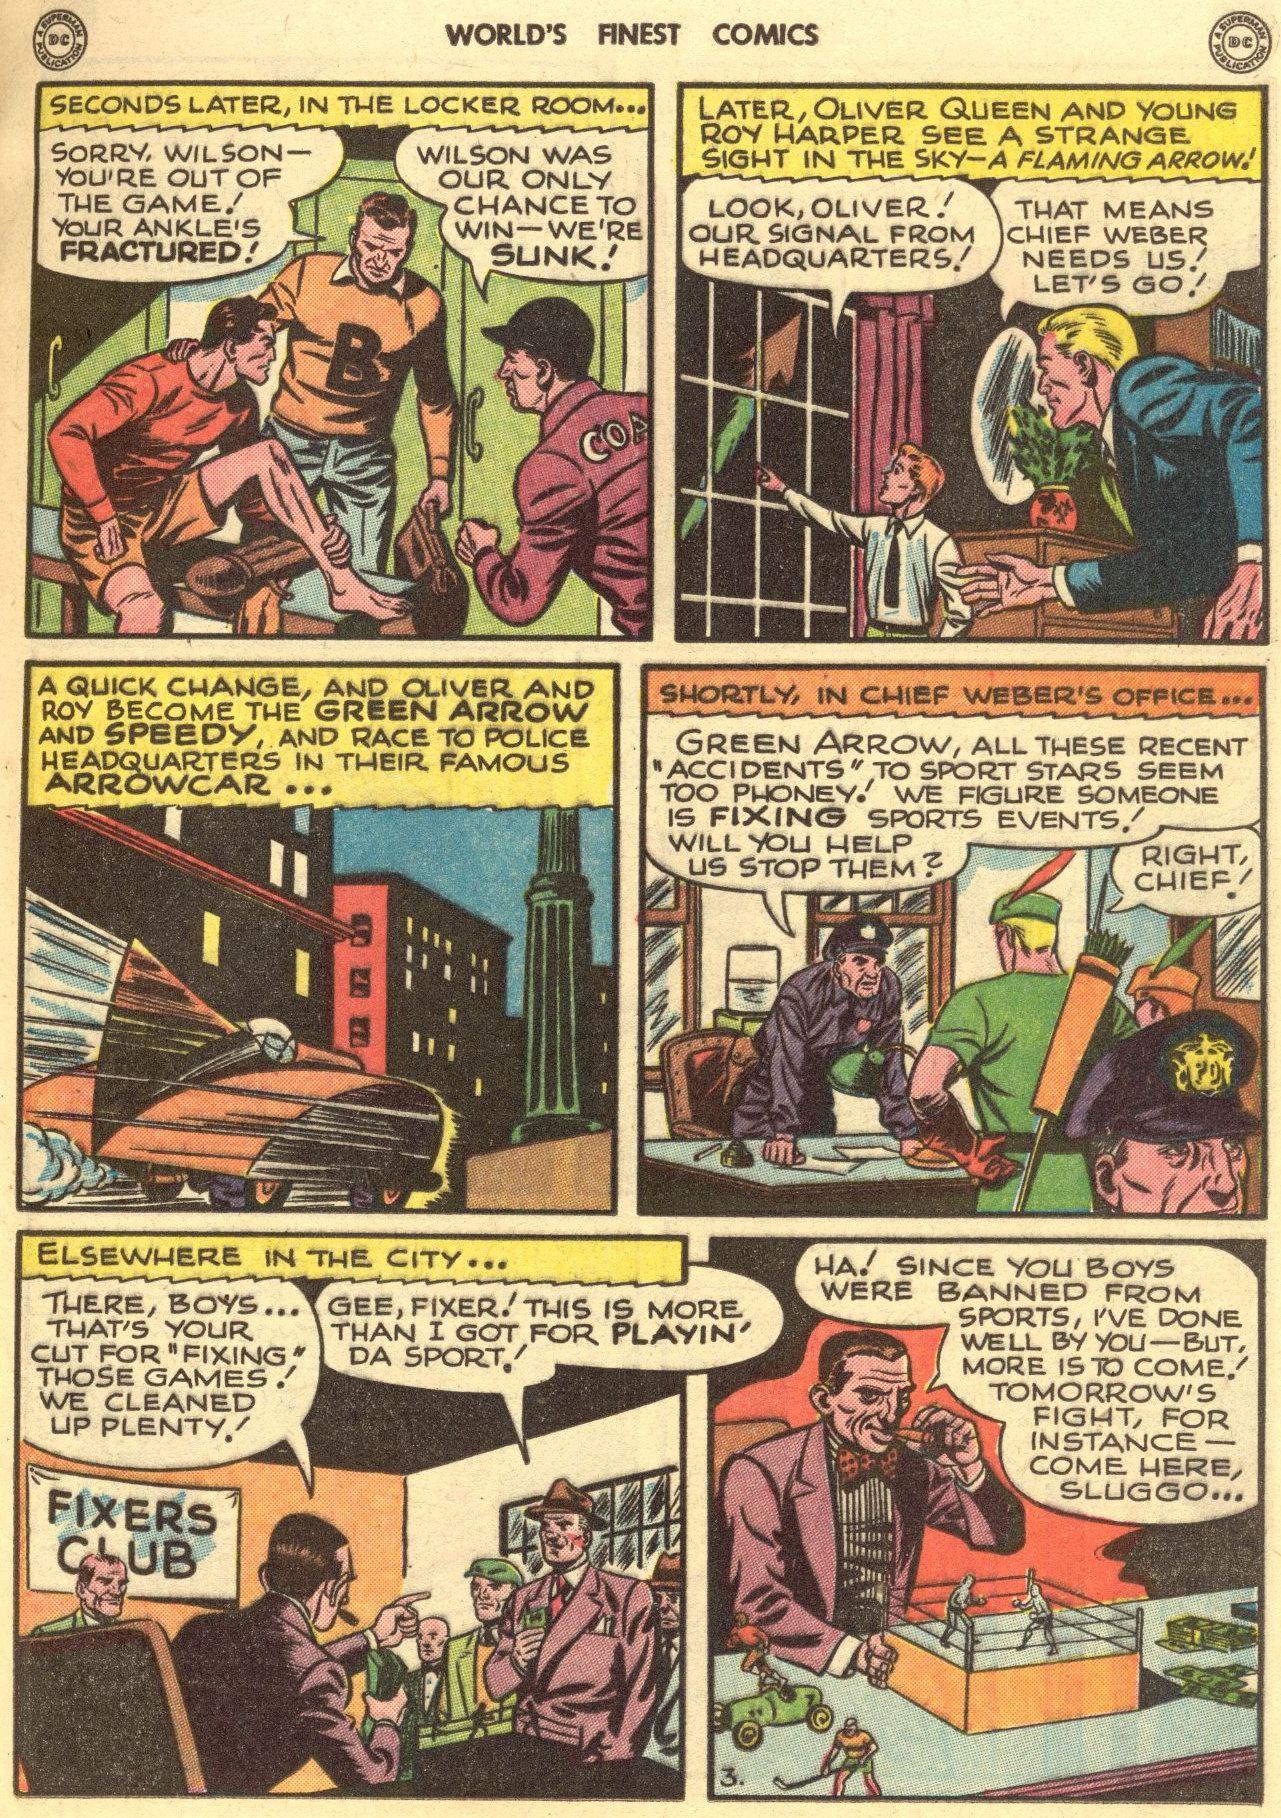 Read online World's Finest Comics comic -  Issue #28 - 18